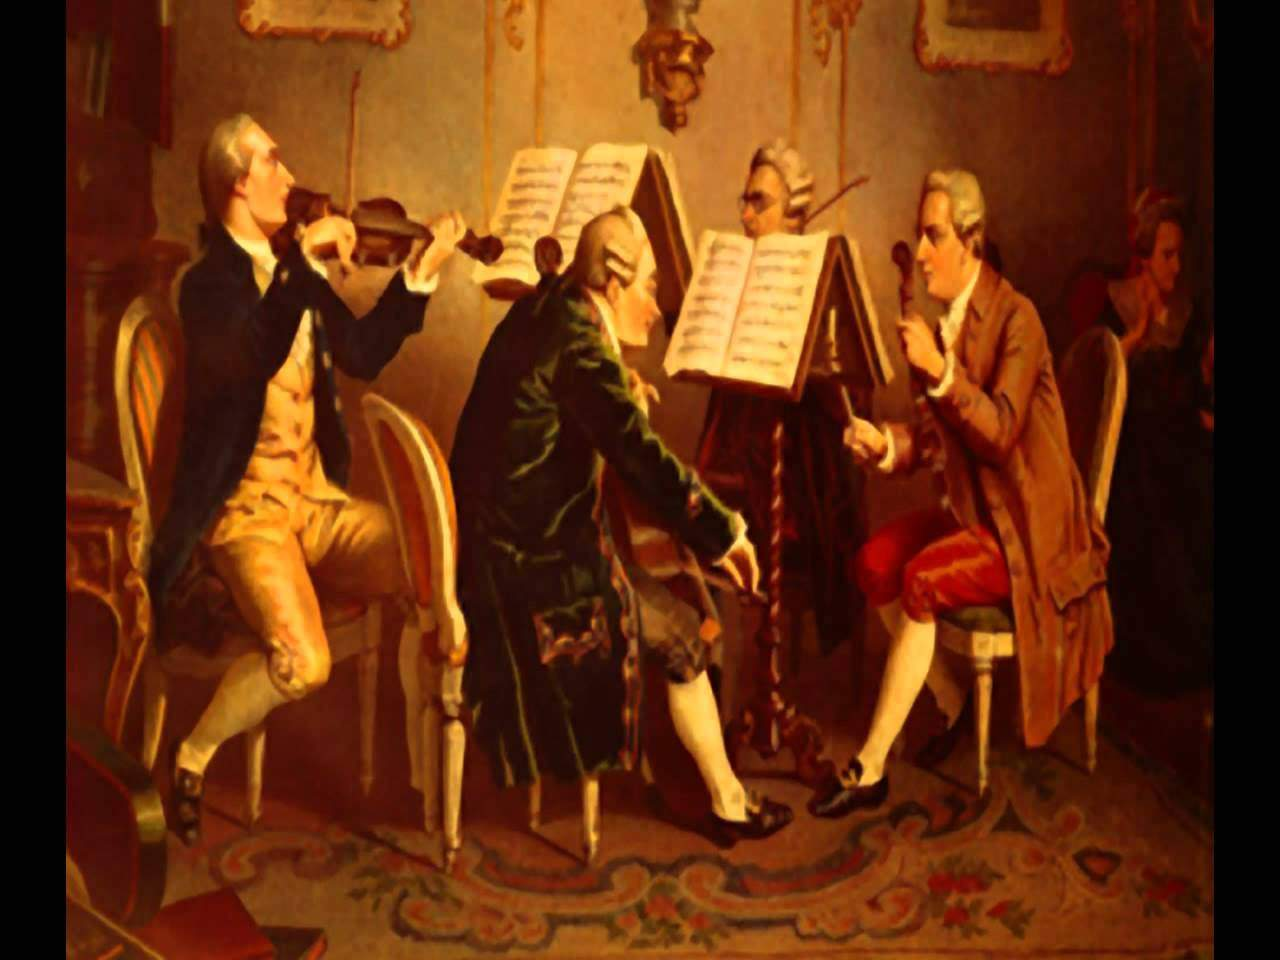 особое место в творчестве моцарта занимает